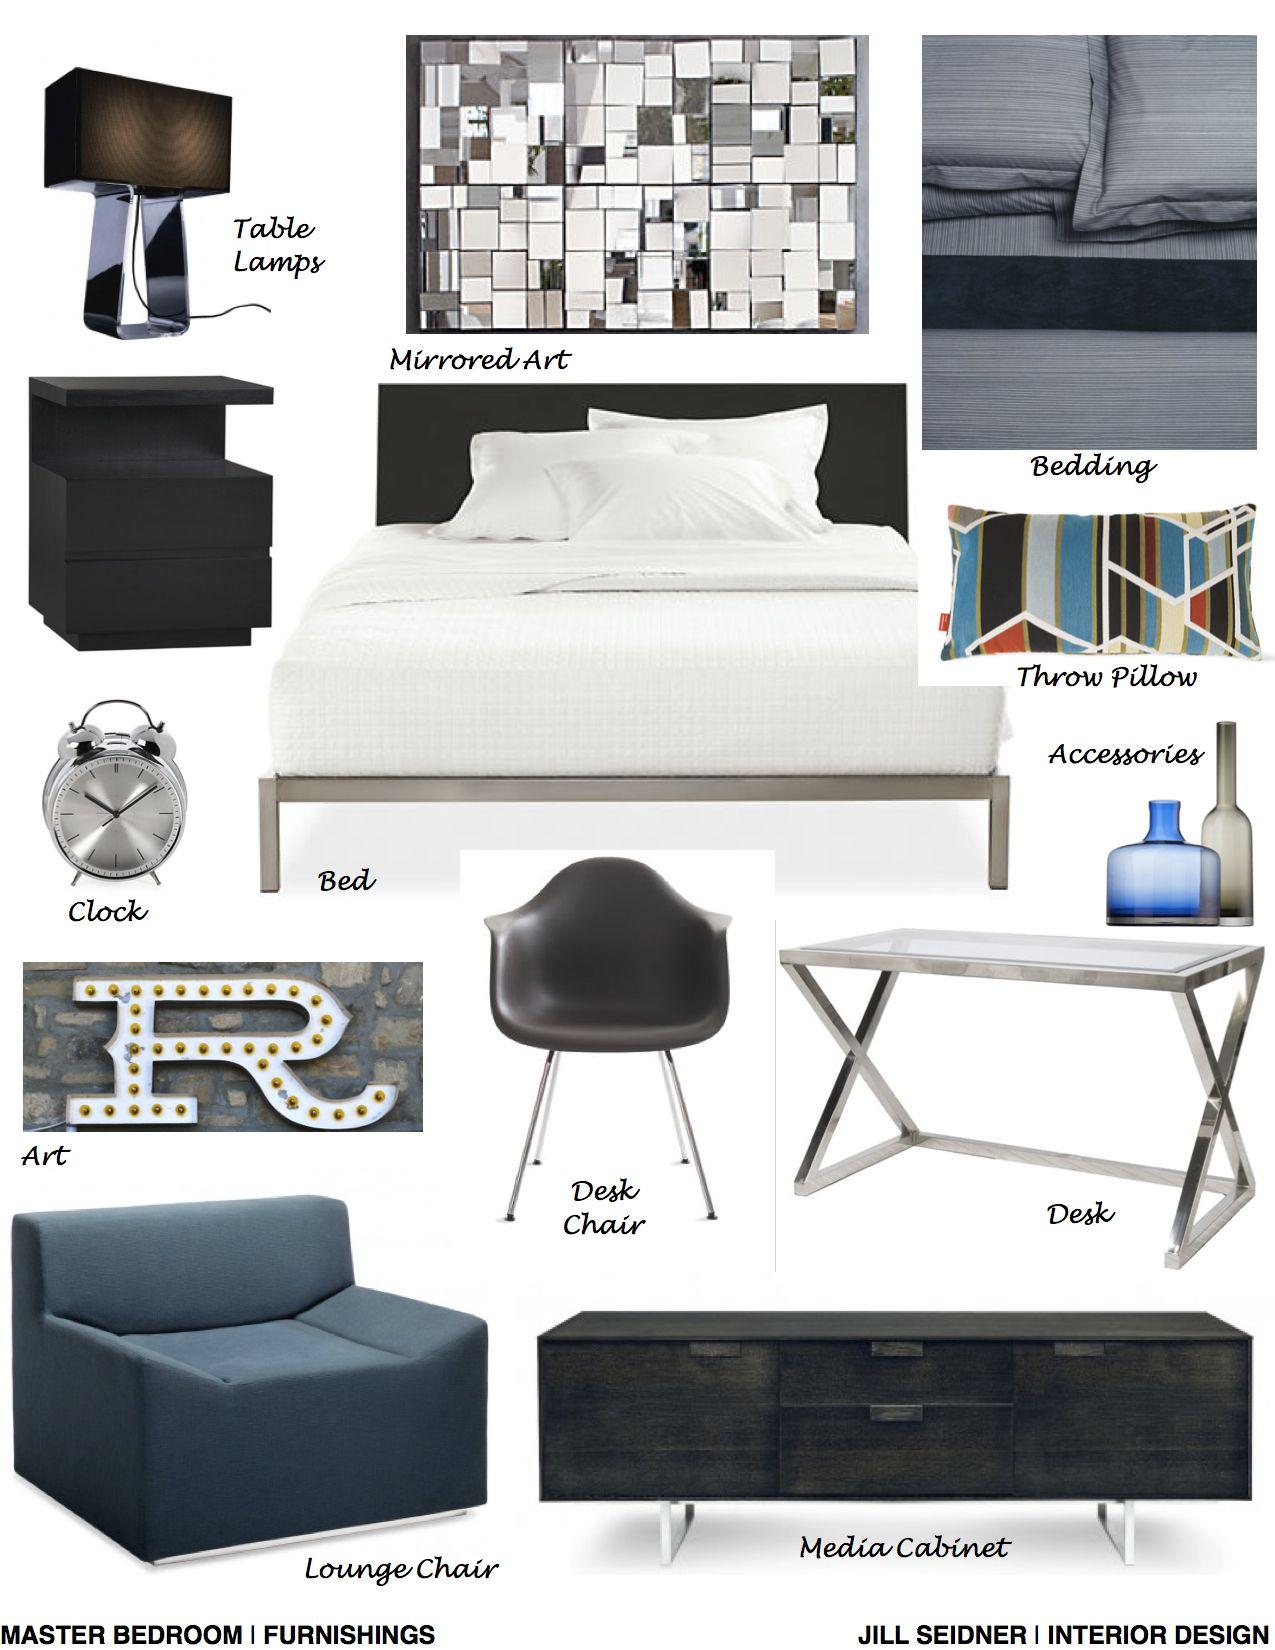 North Hollywood Ca Residence Master Bedroom Furnishings Concept Board Www Jsinteriordes Interior Design Boards Interior Design Mood Board Bedroom Furnishings